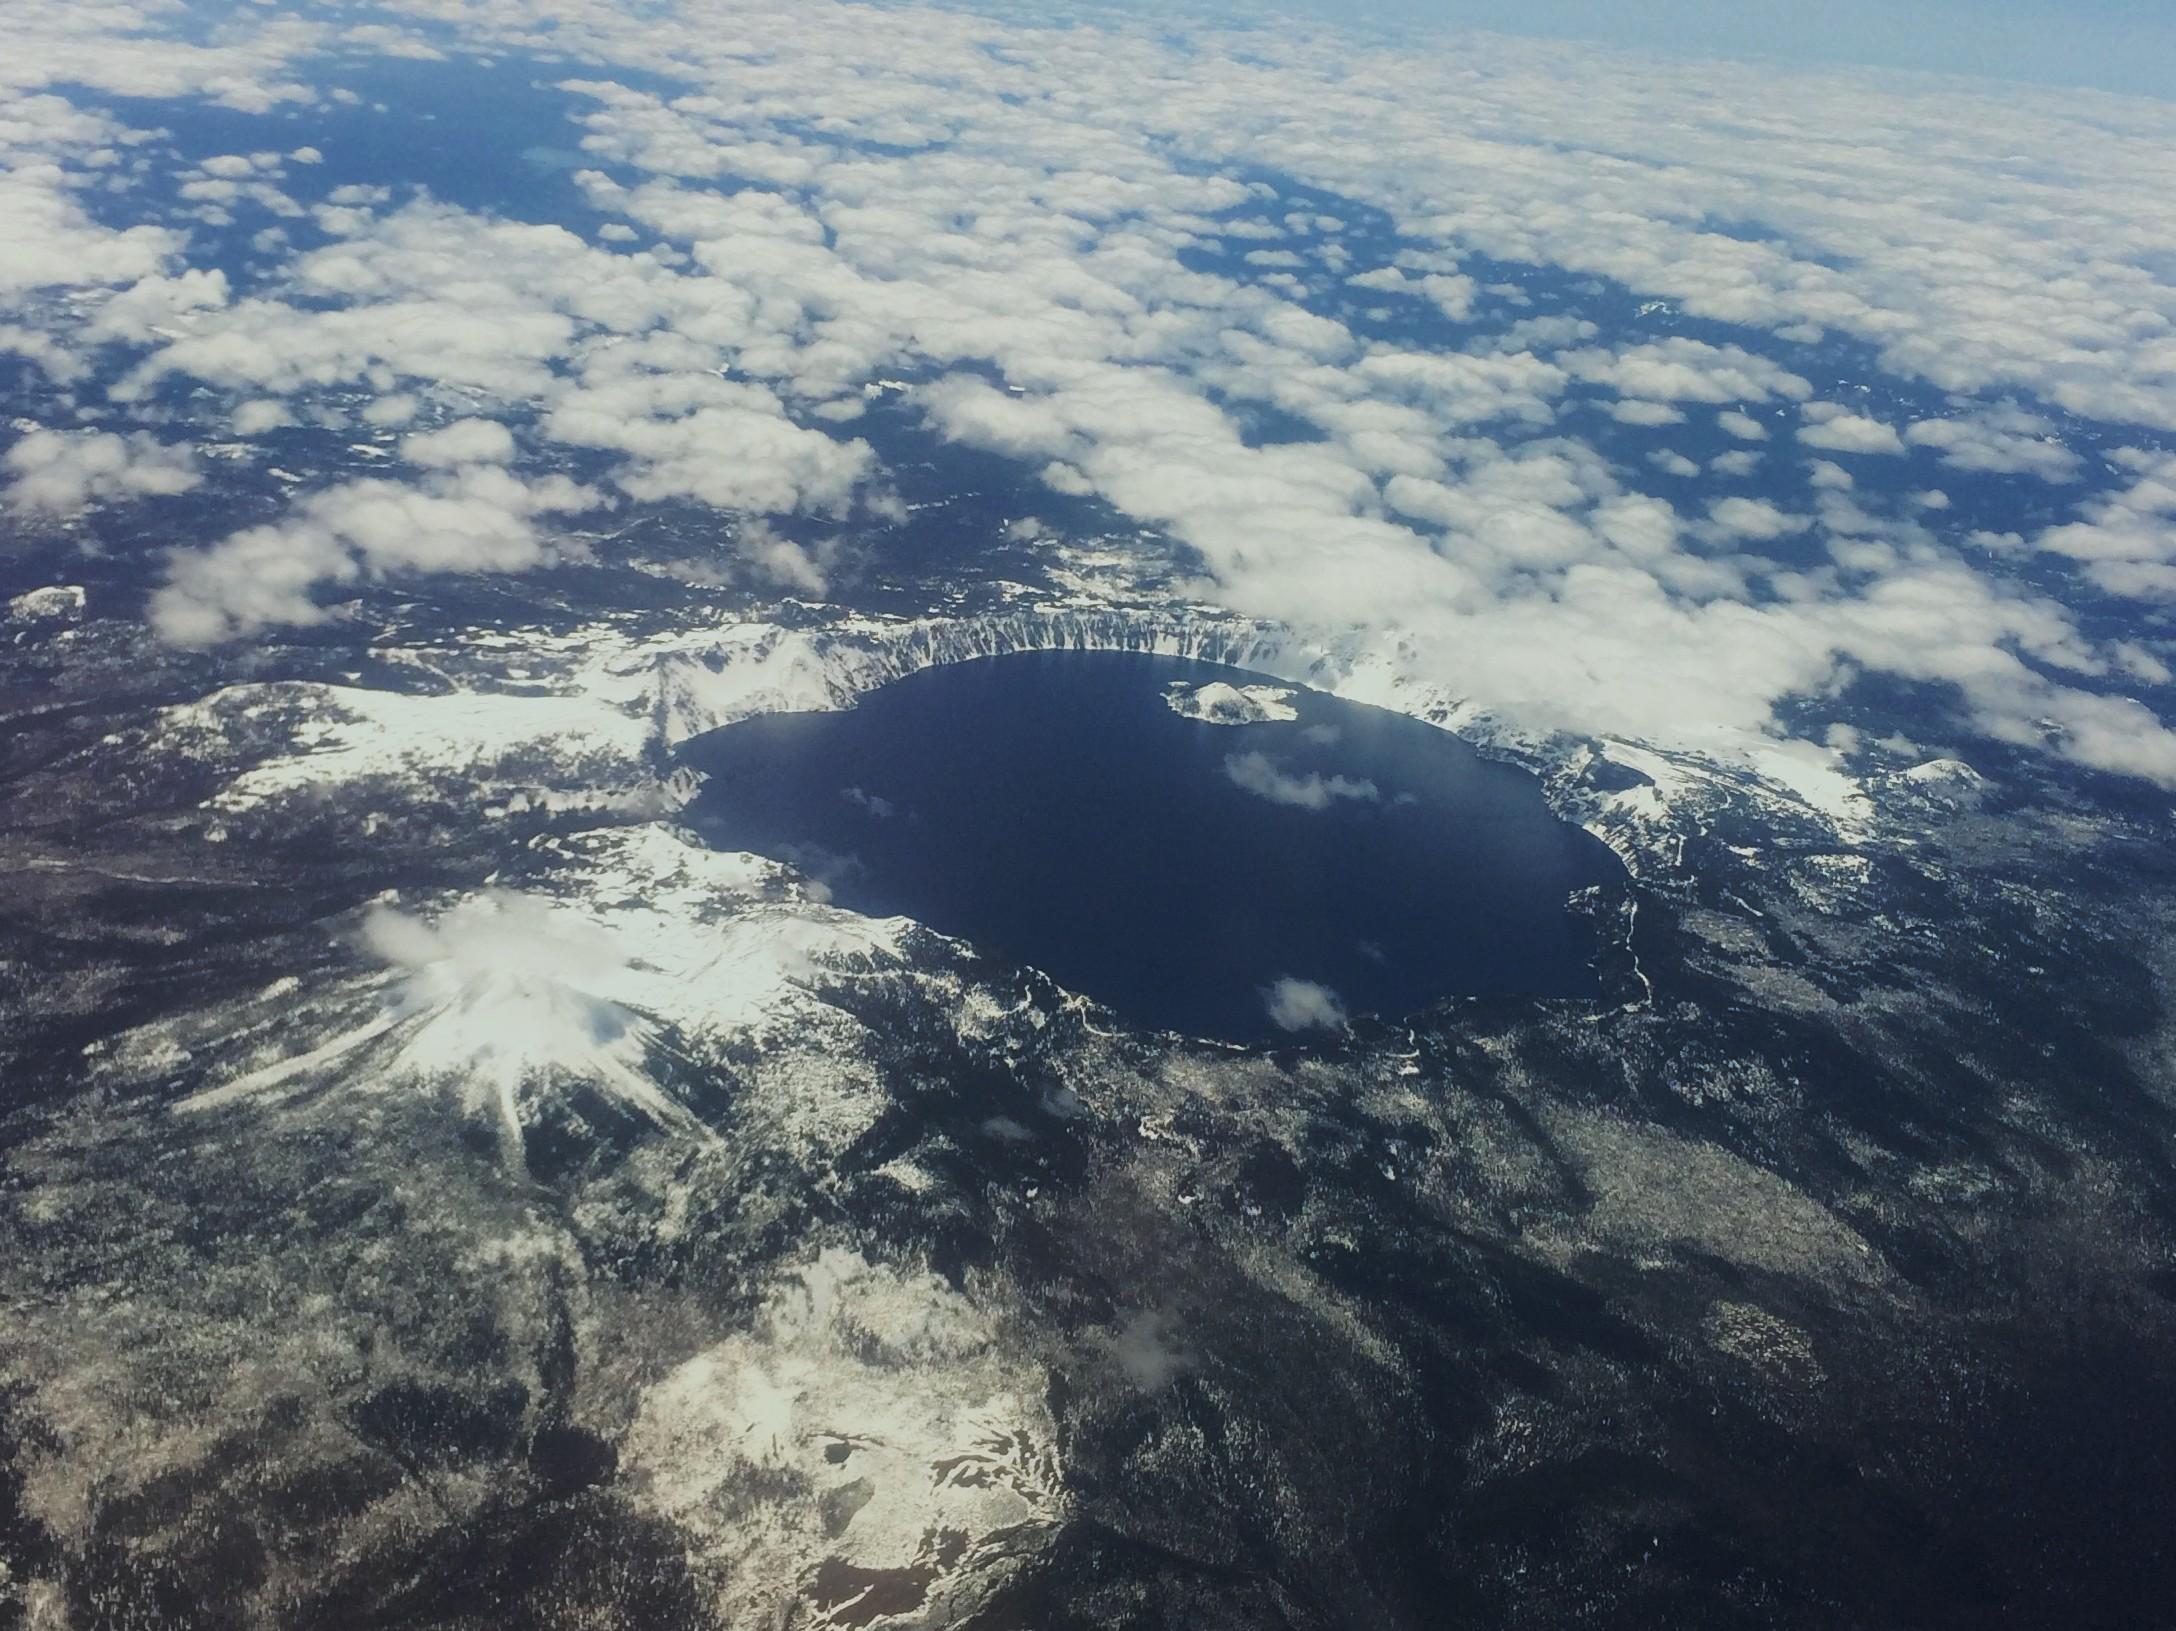 Free tour of Crater Lake, courtesy of Southwest